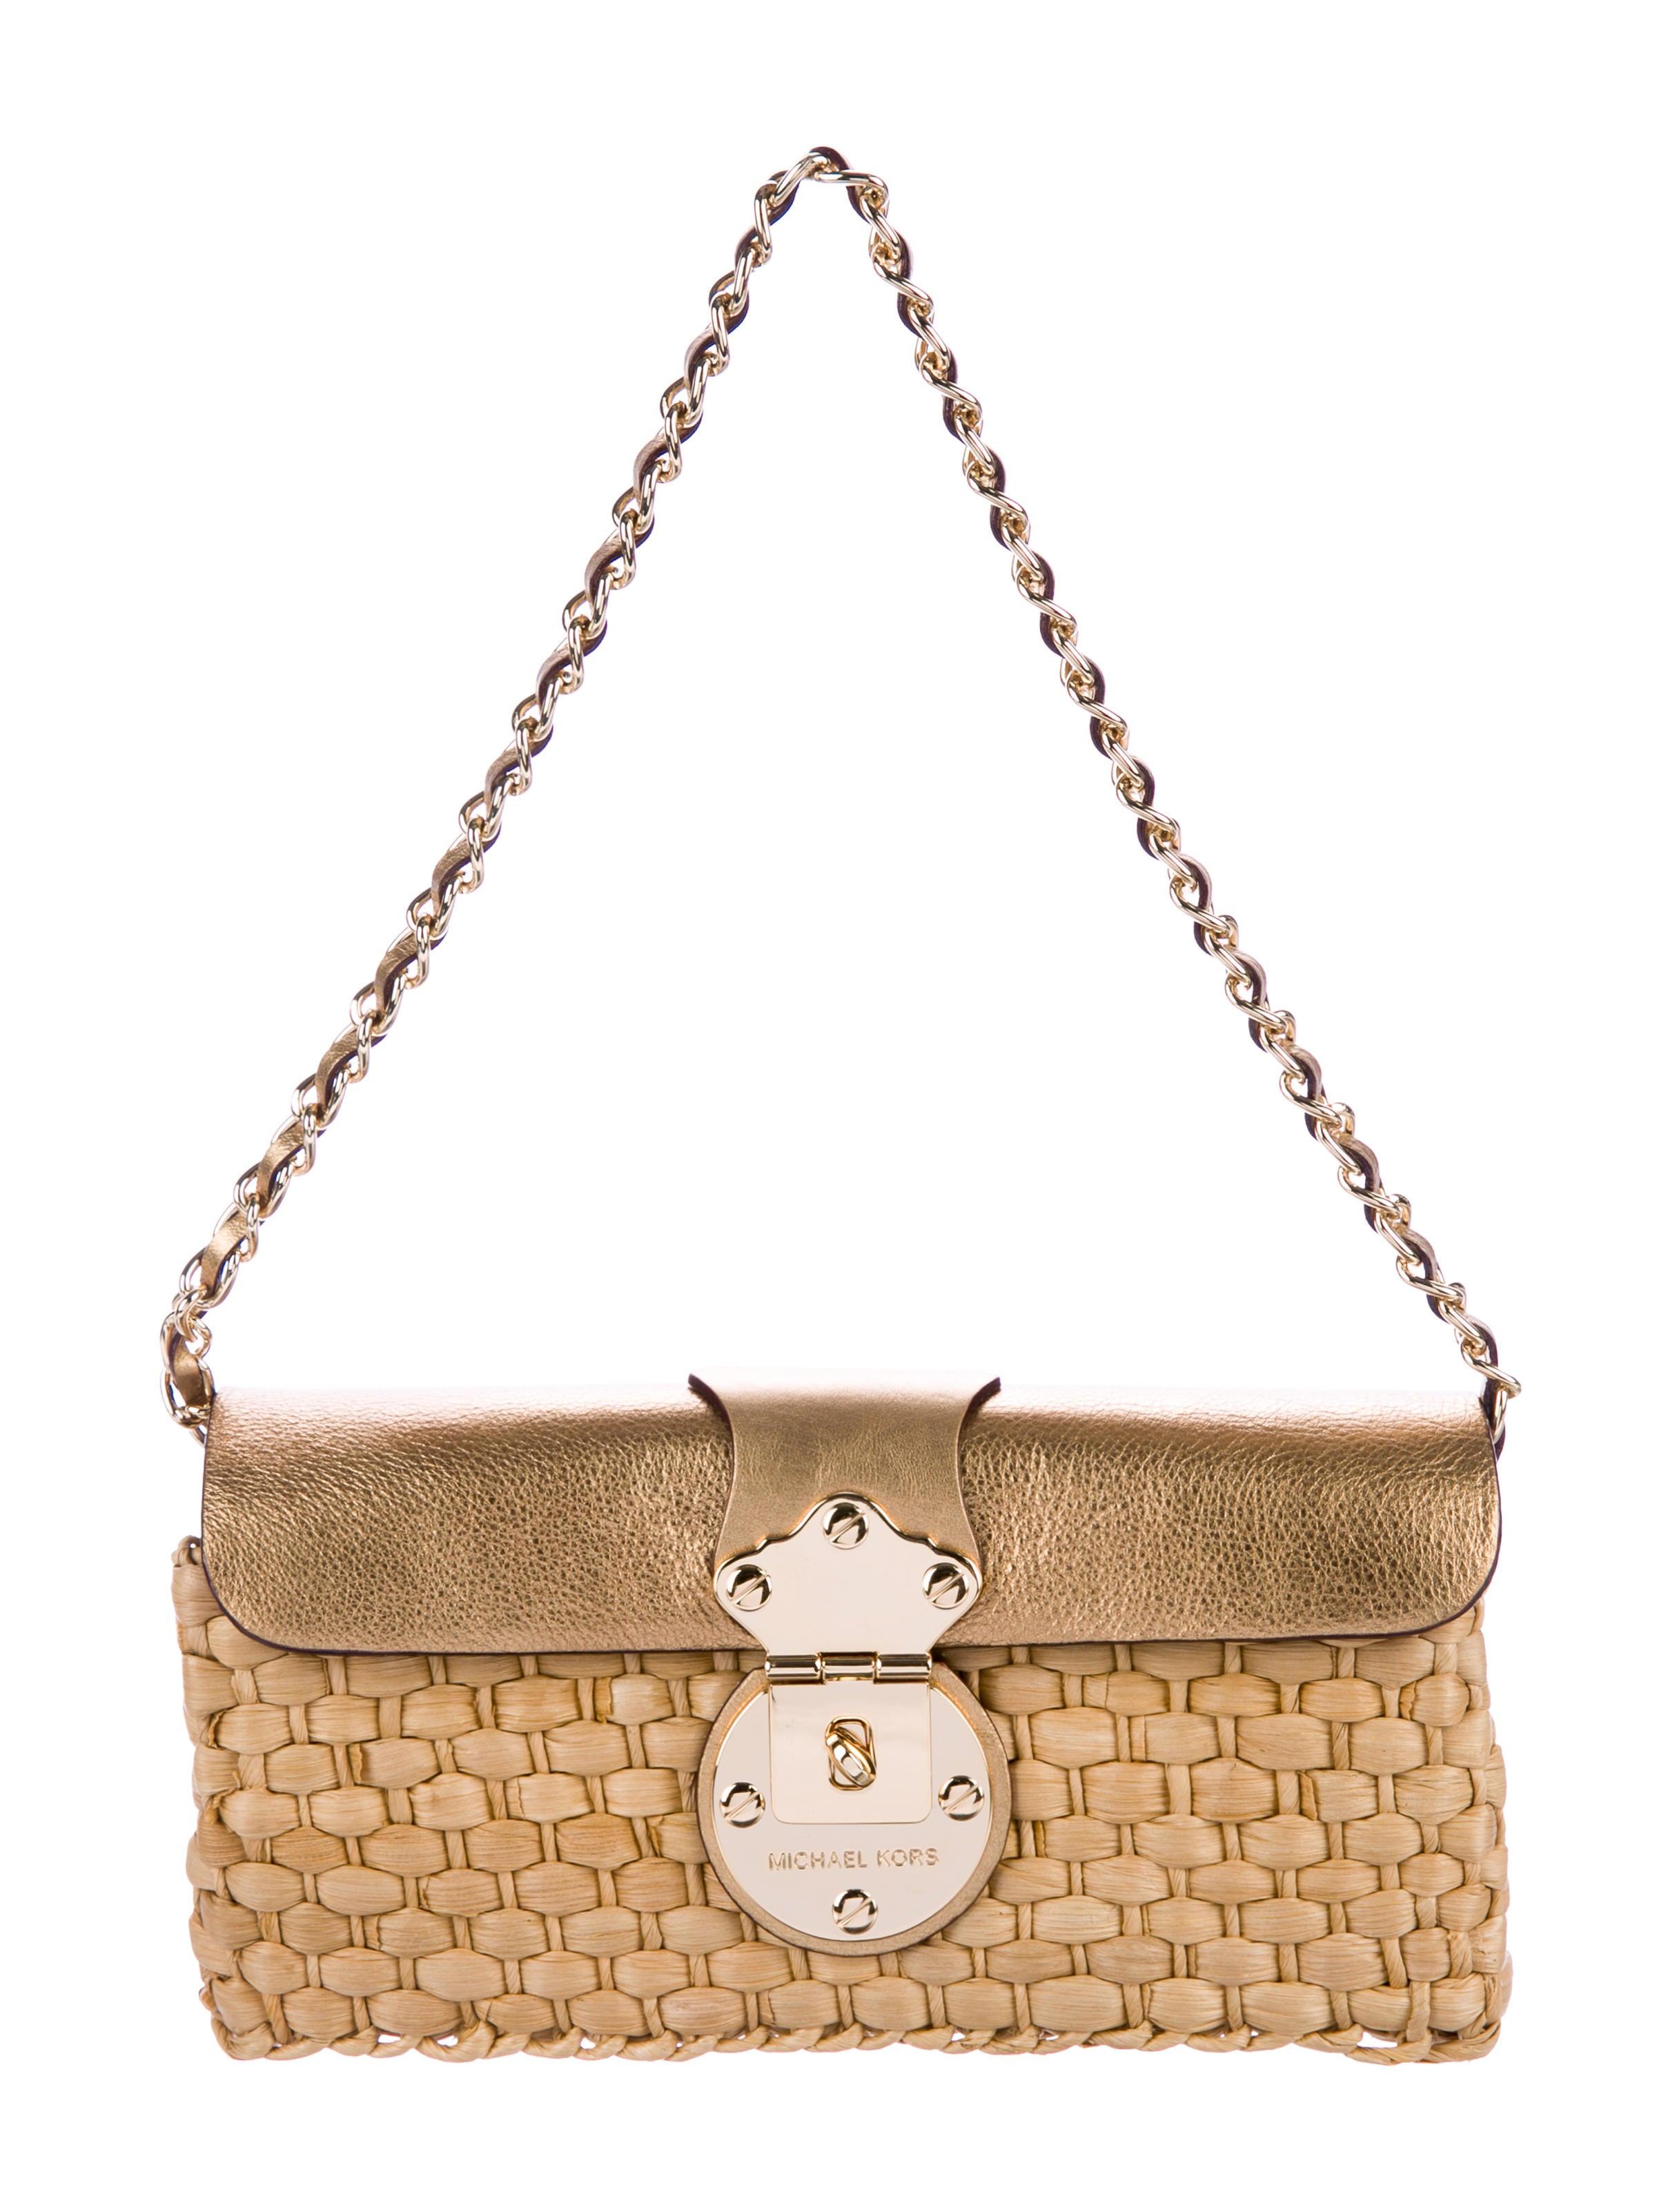 954747b1e549 Michael Michael Kors Leather-Trimmed Woven Raffia Bag - Handbags ...